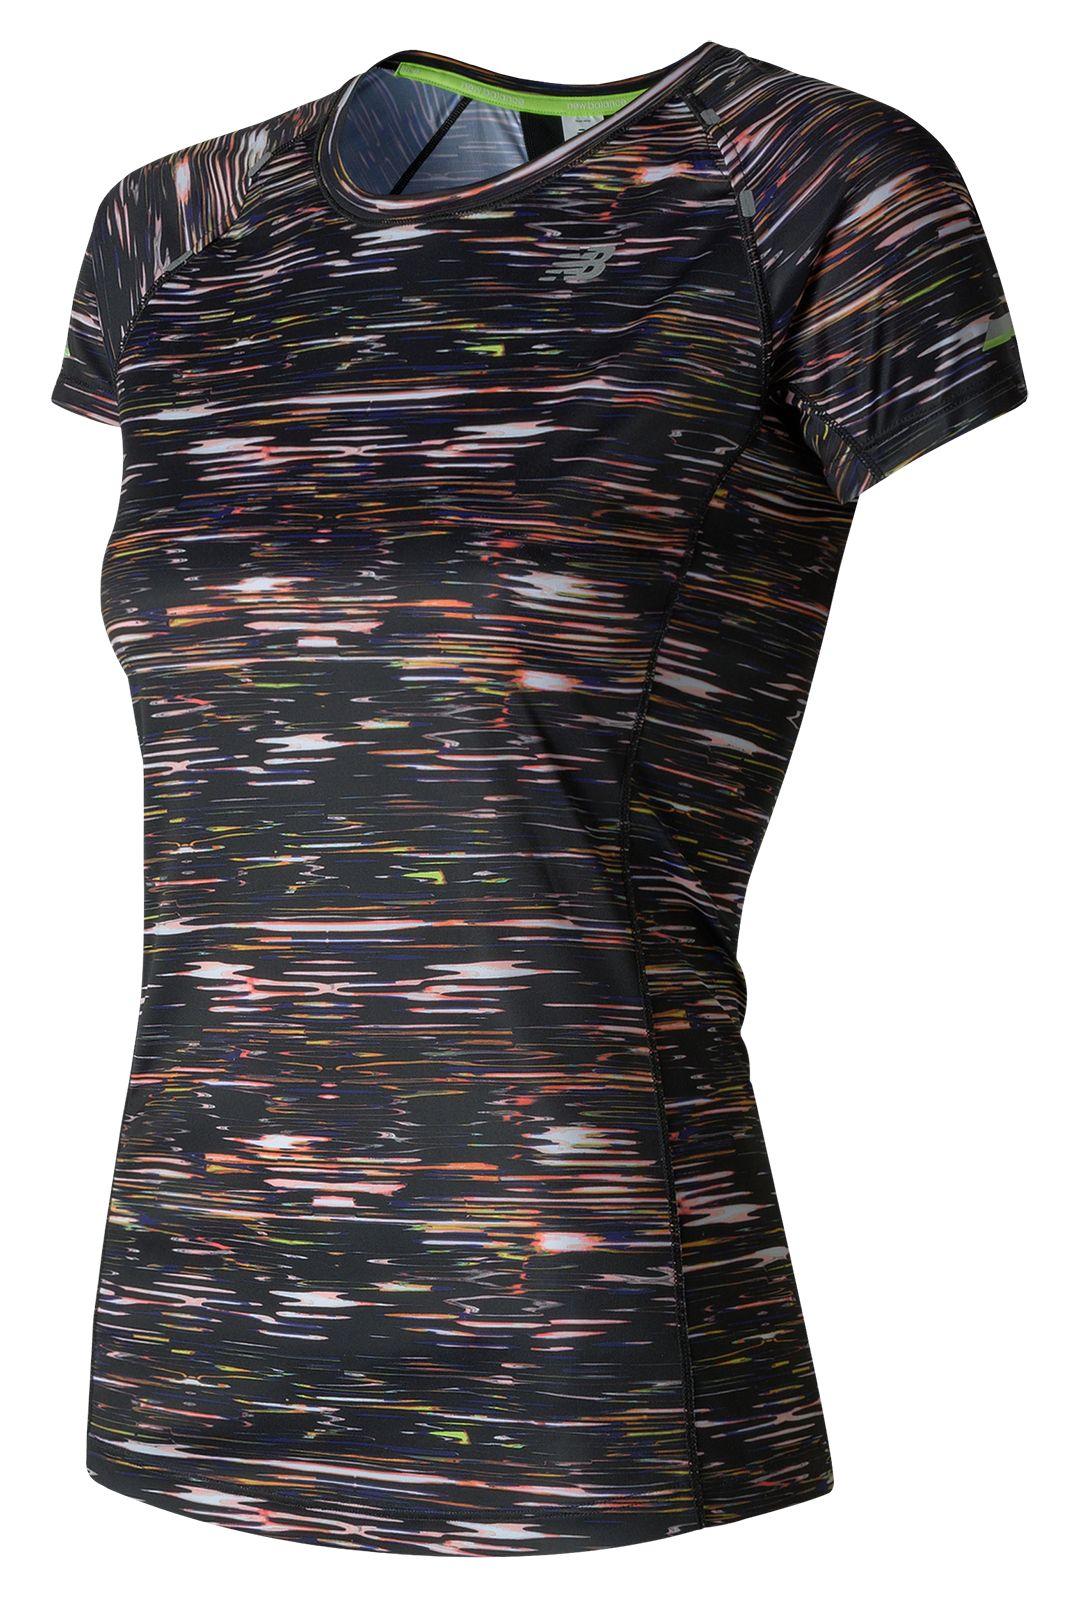 New Balance : NB Ice Short Sleeve Print : Women's Performance : WT71224MIS